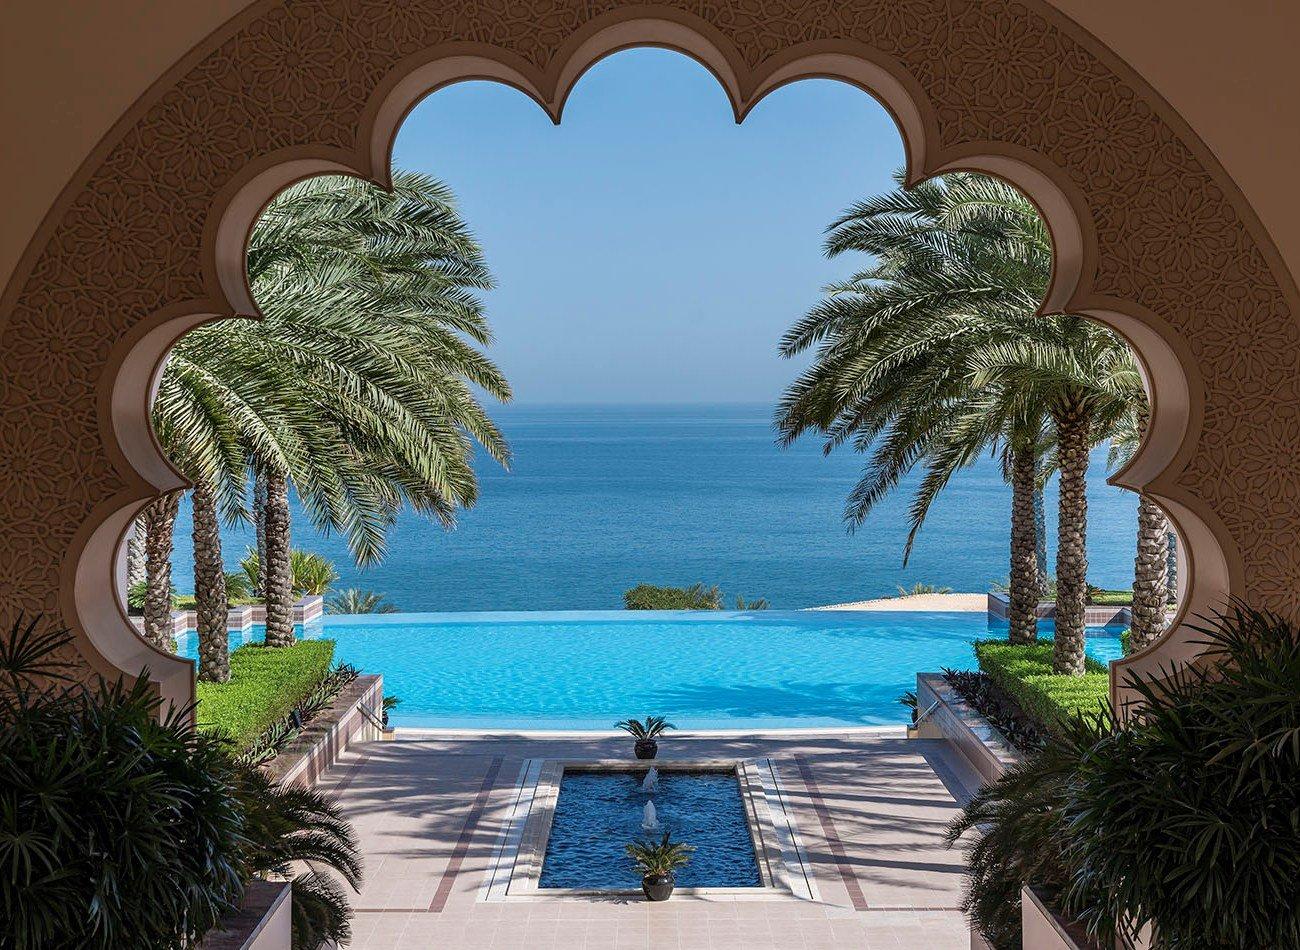 Hotel Shangri-La Al Husn - Muscat